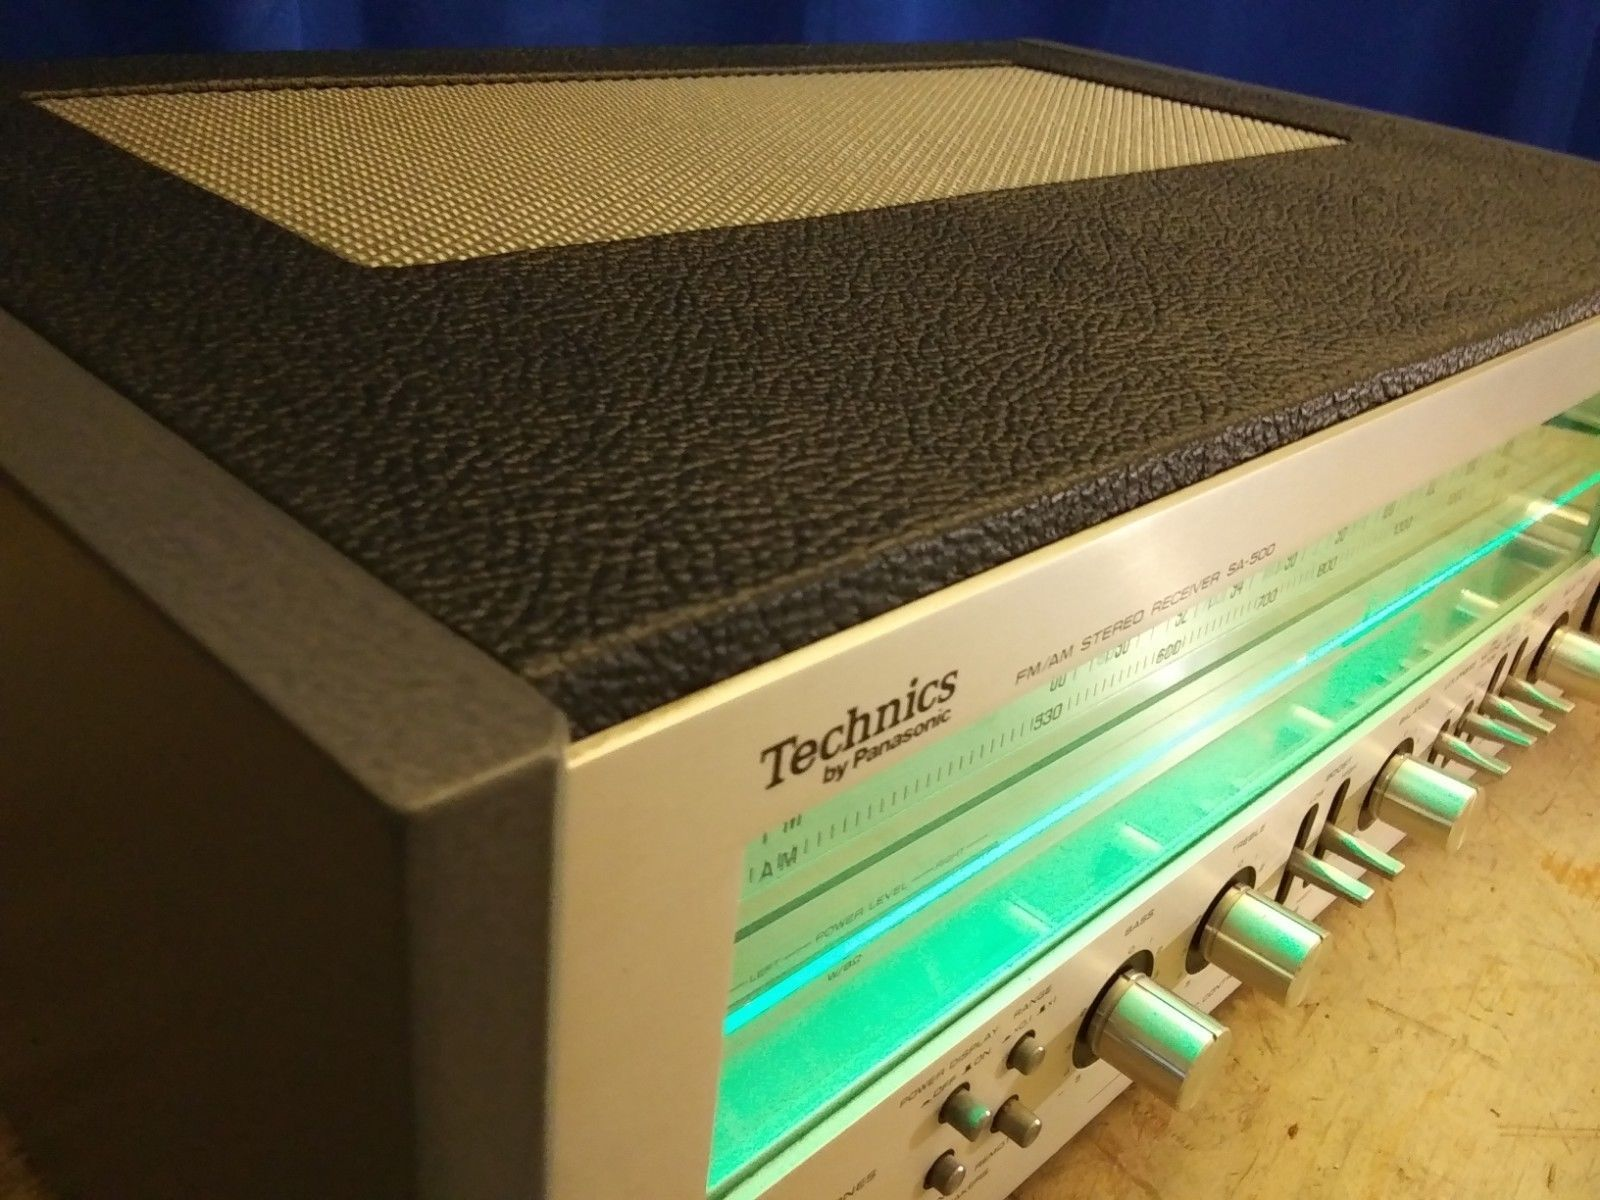 Vintage Technics SA-500 Stereo Receiver / Green LED / Custom